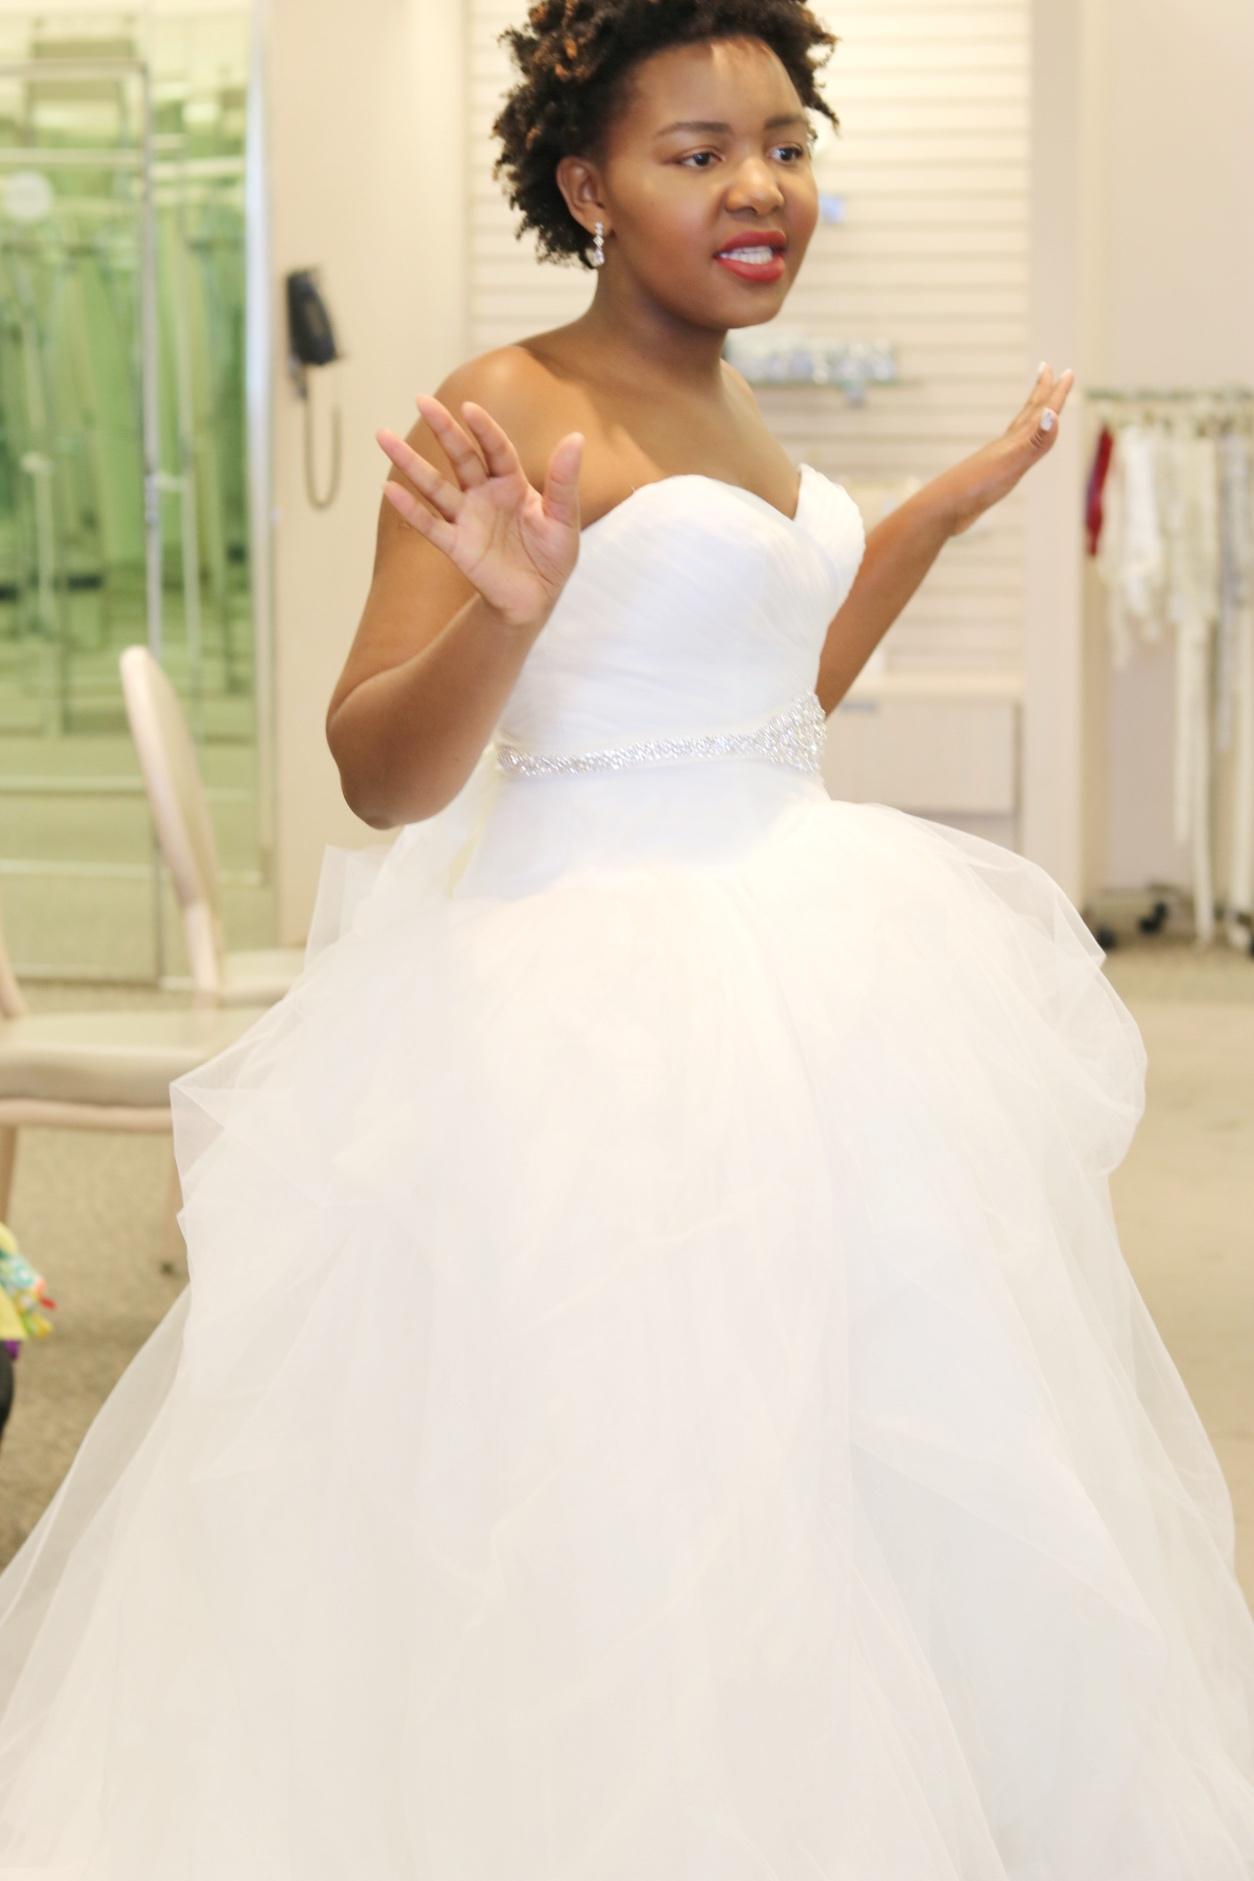 Ball Gown Dress David's Bridal